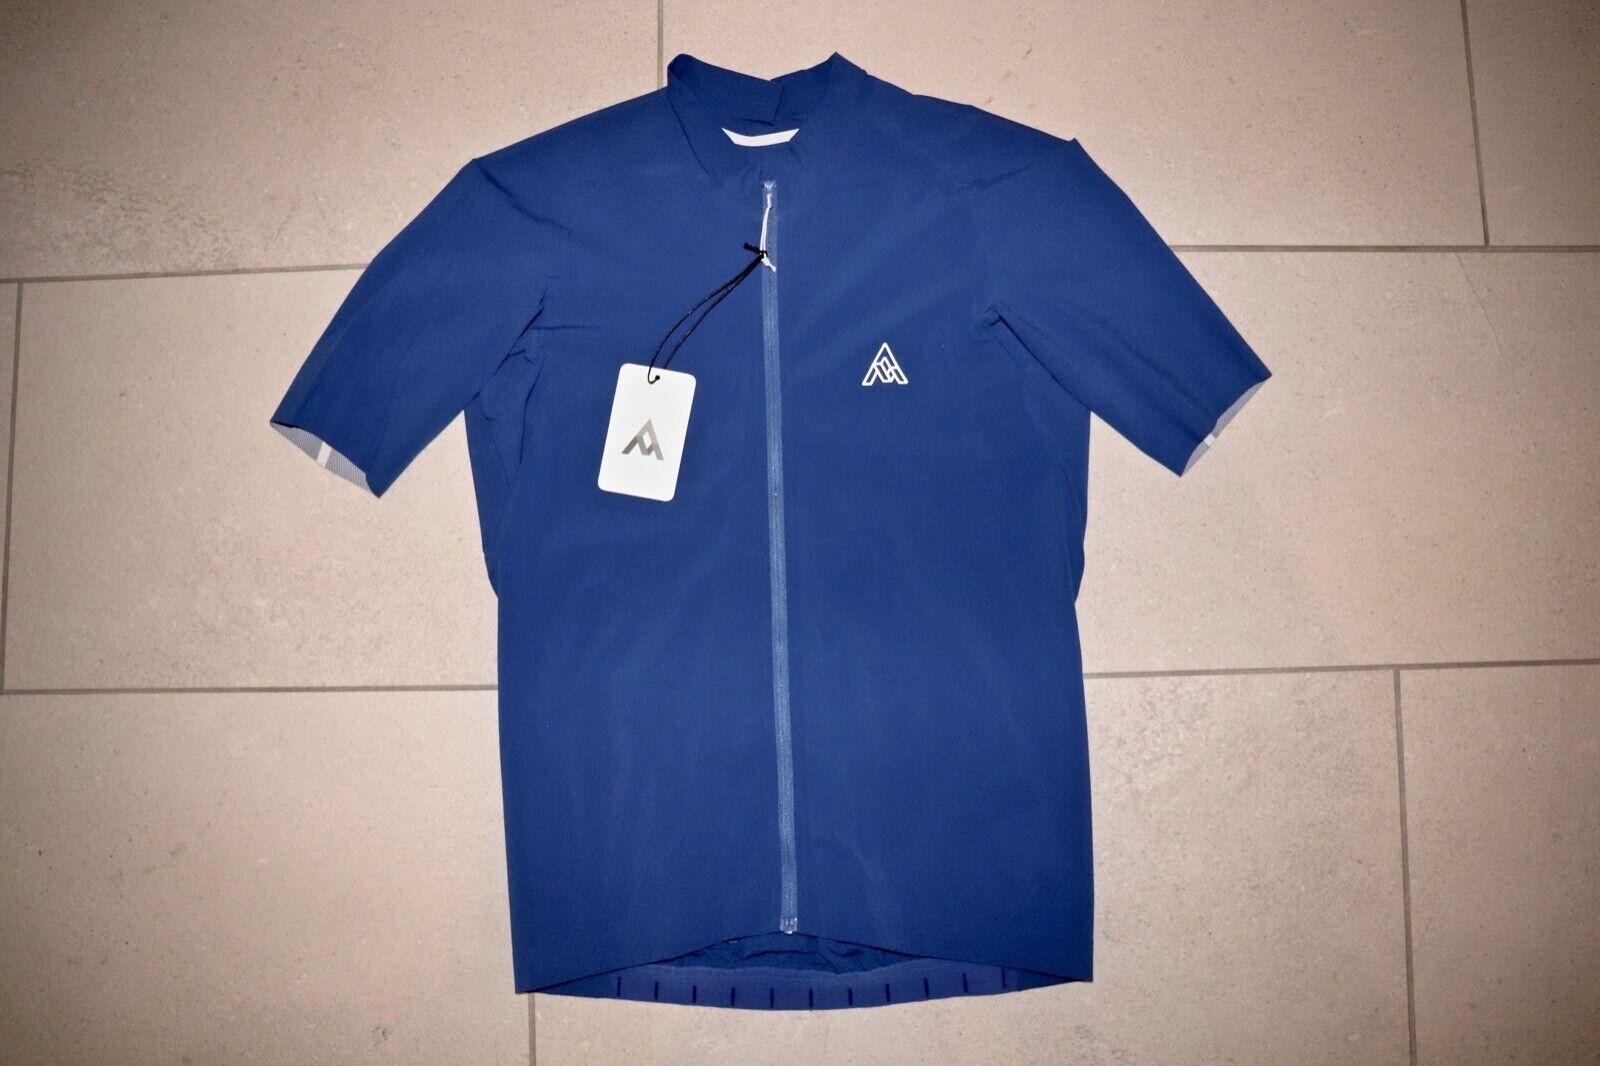 7mesh Highline Superlight Jersey M's, Stellar bluee VK 175,-  Muster-Verkauf